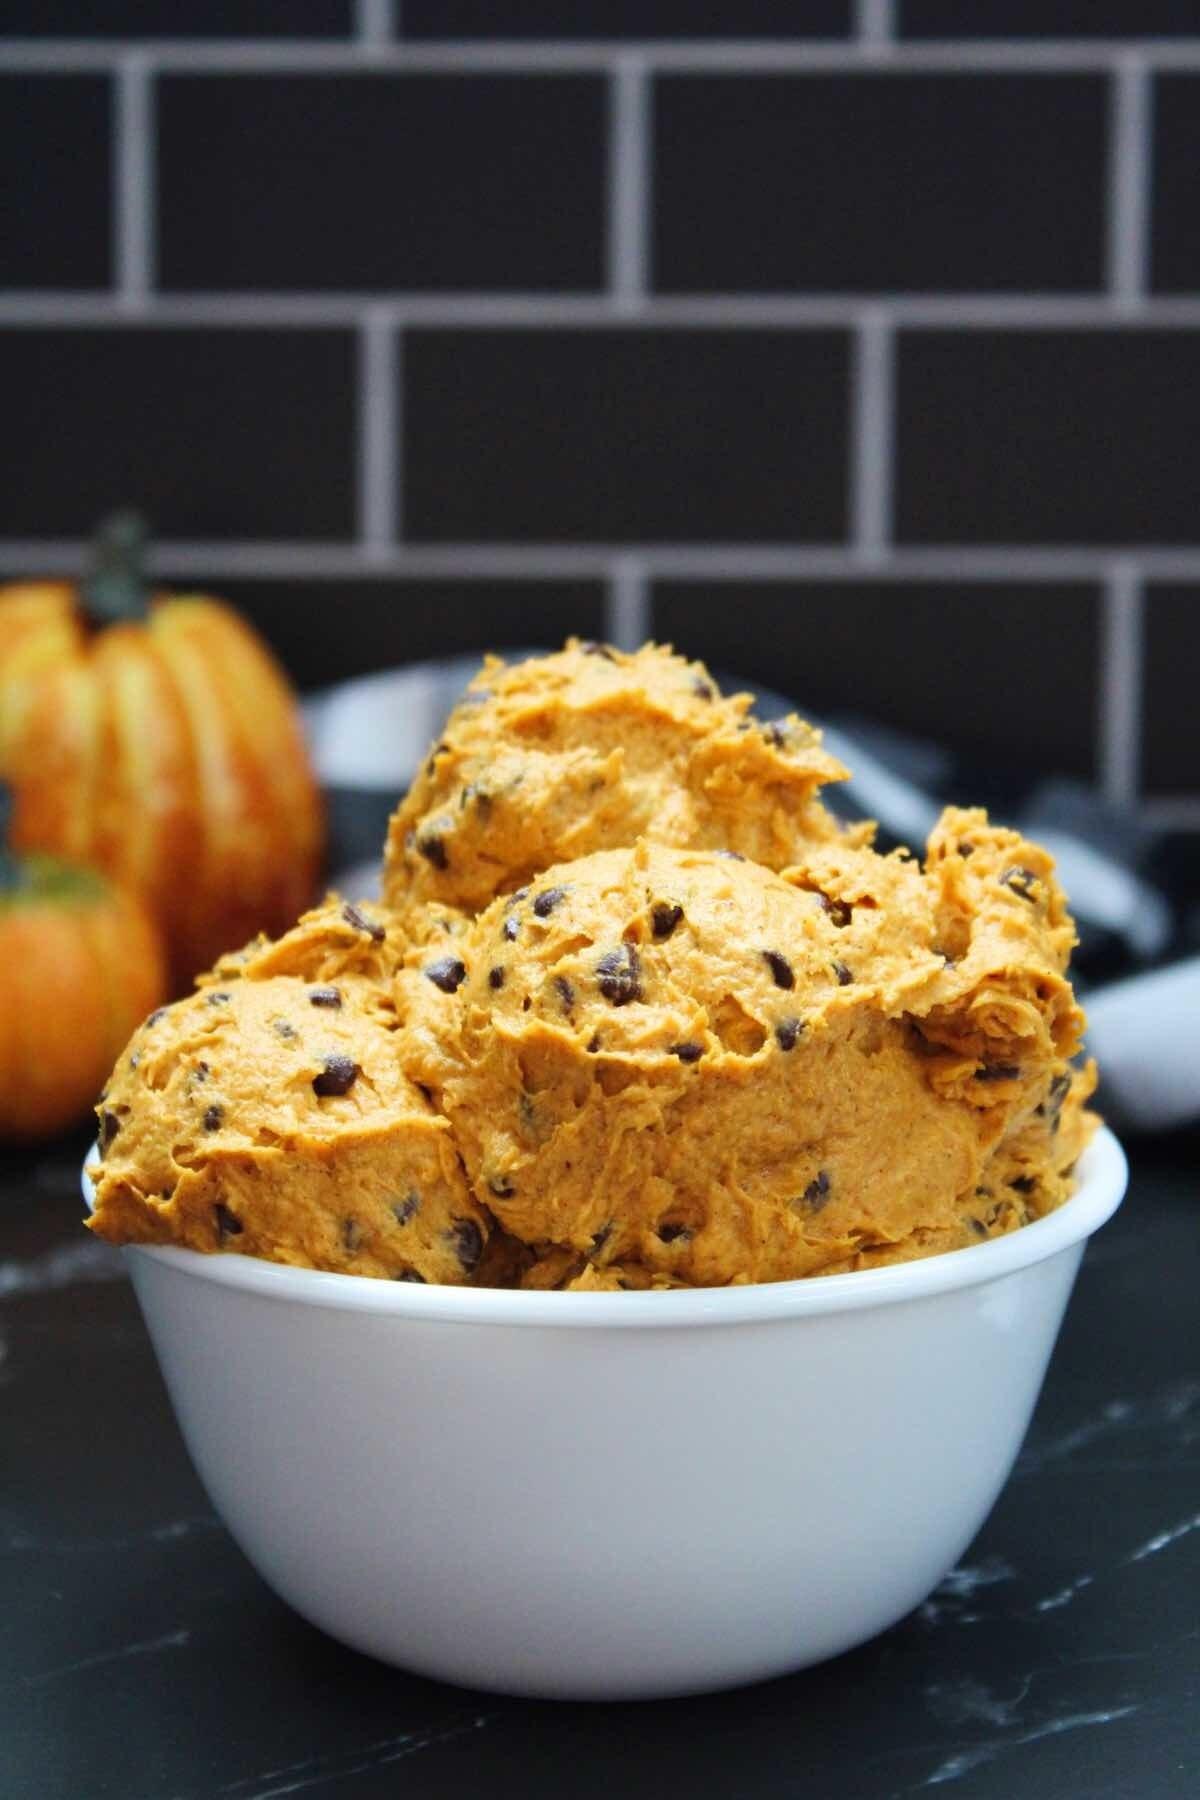 Edible pumpkin cookie dough in a white bowl.